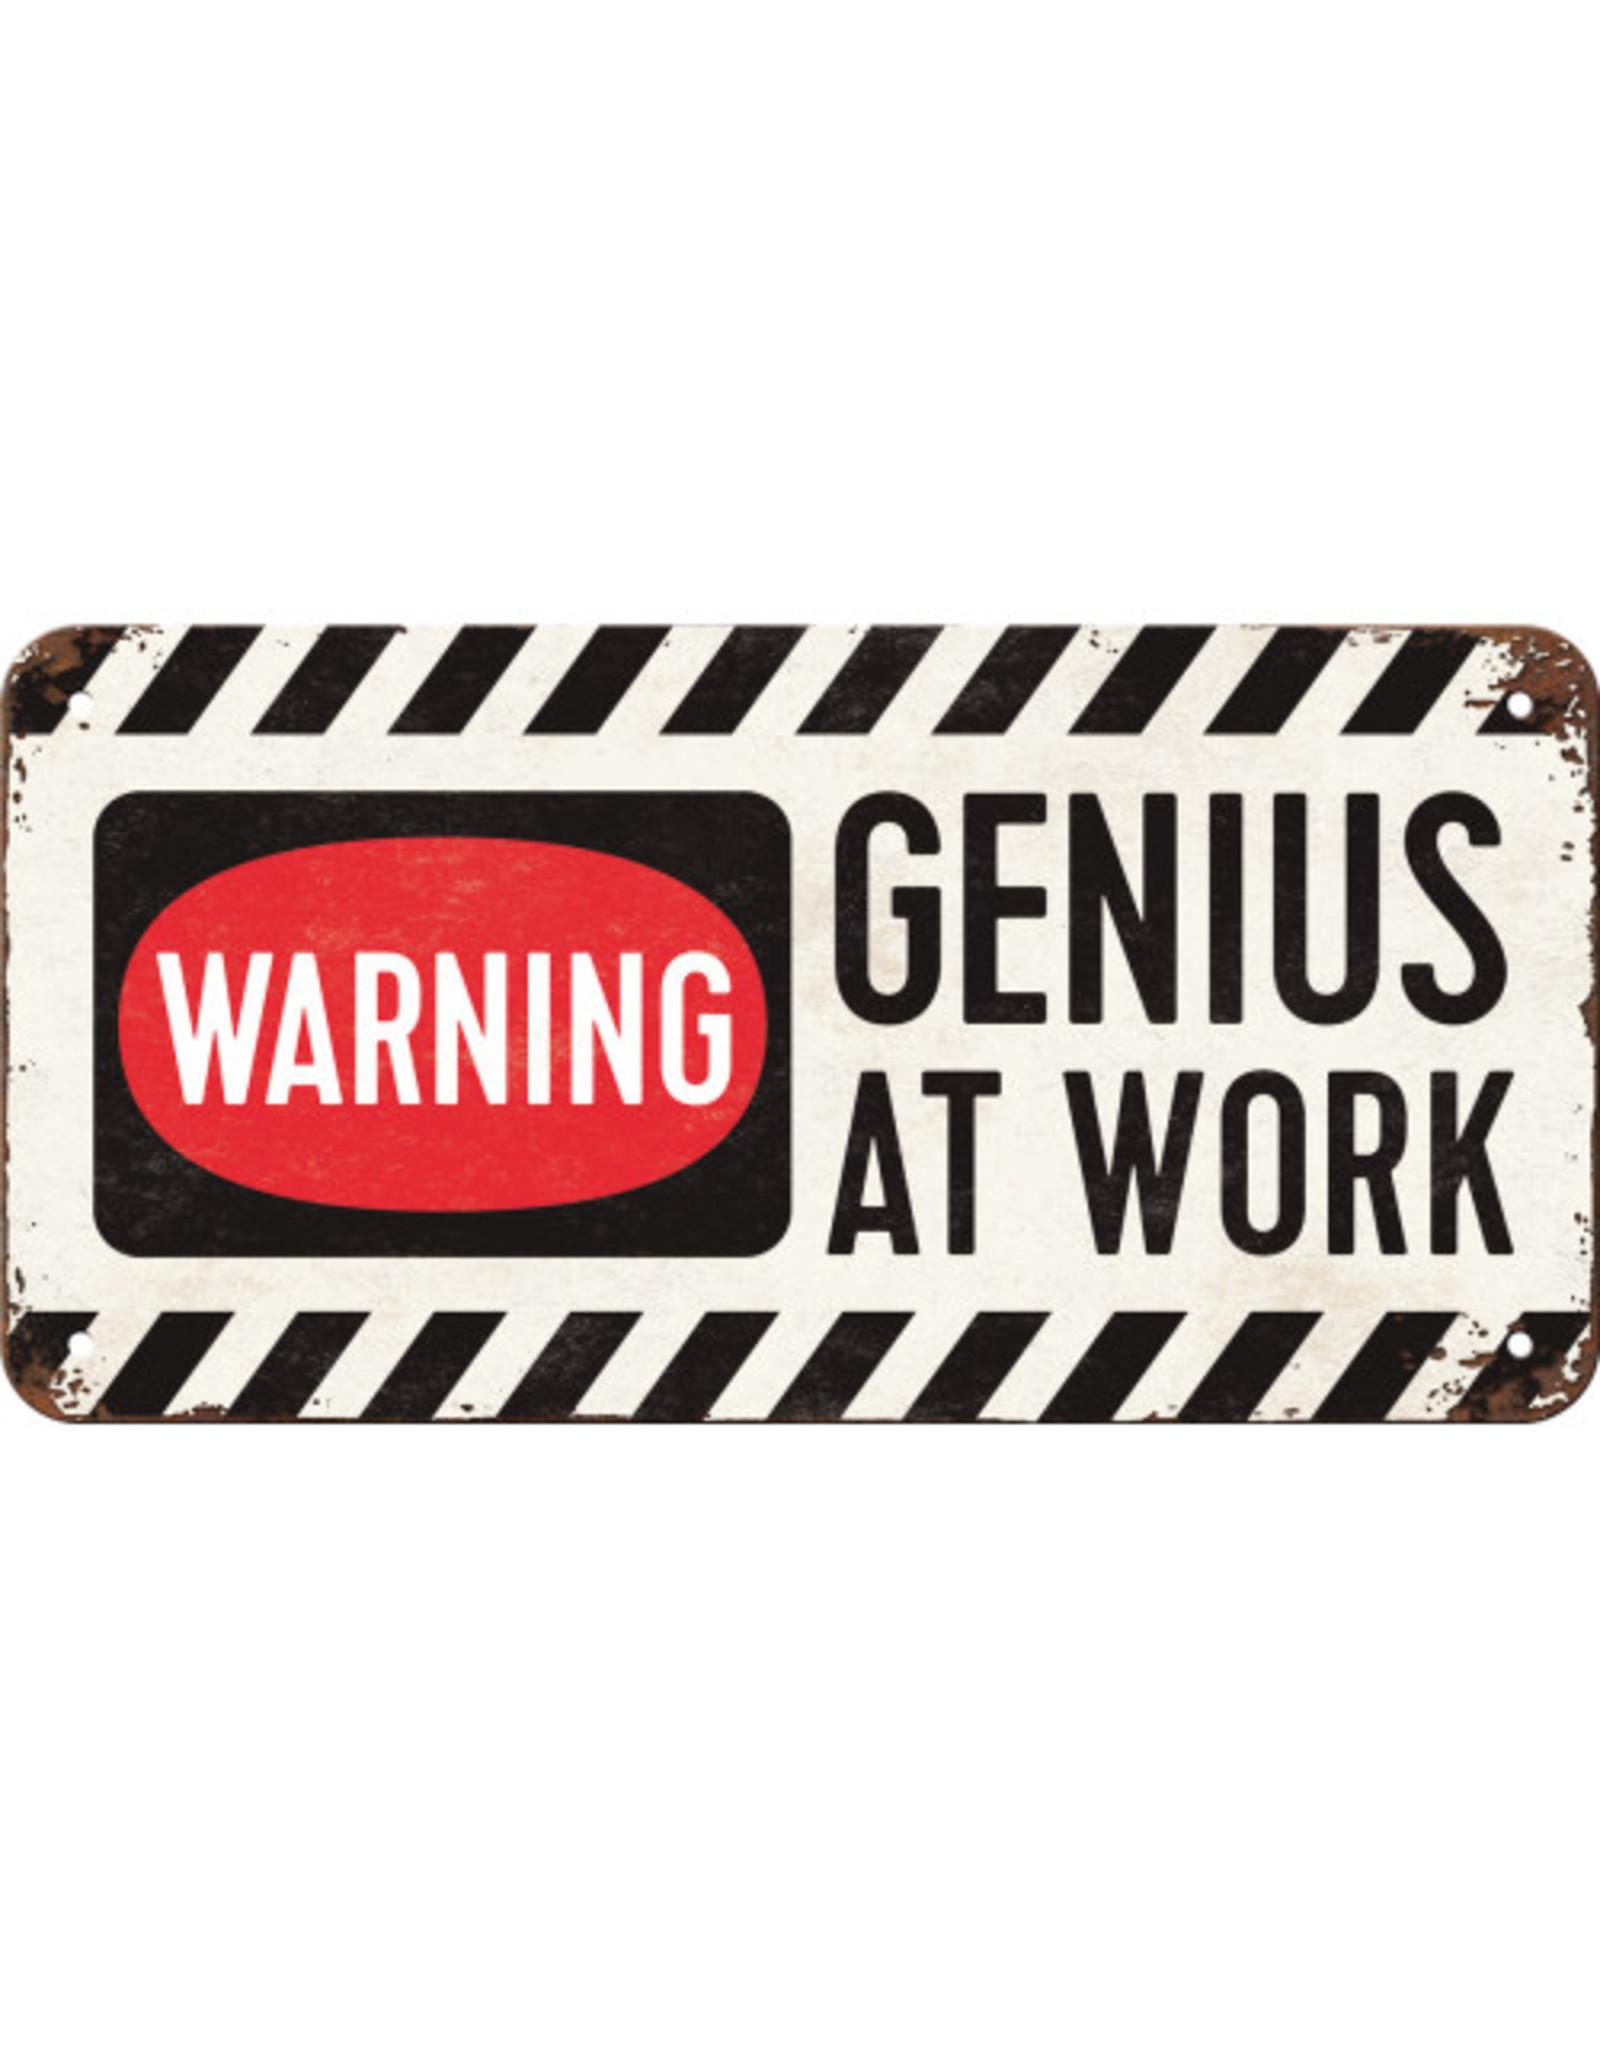 hanging sign - genius at work